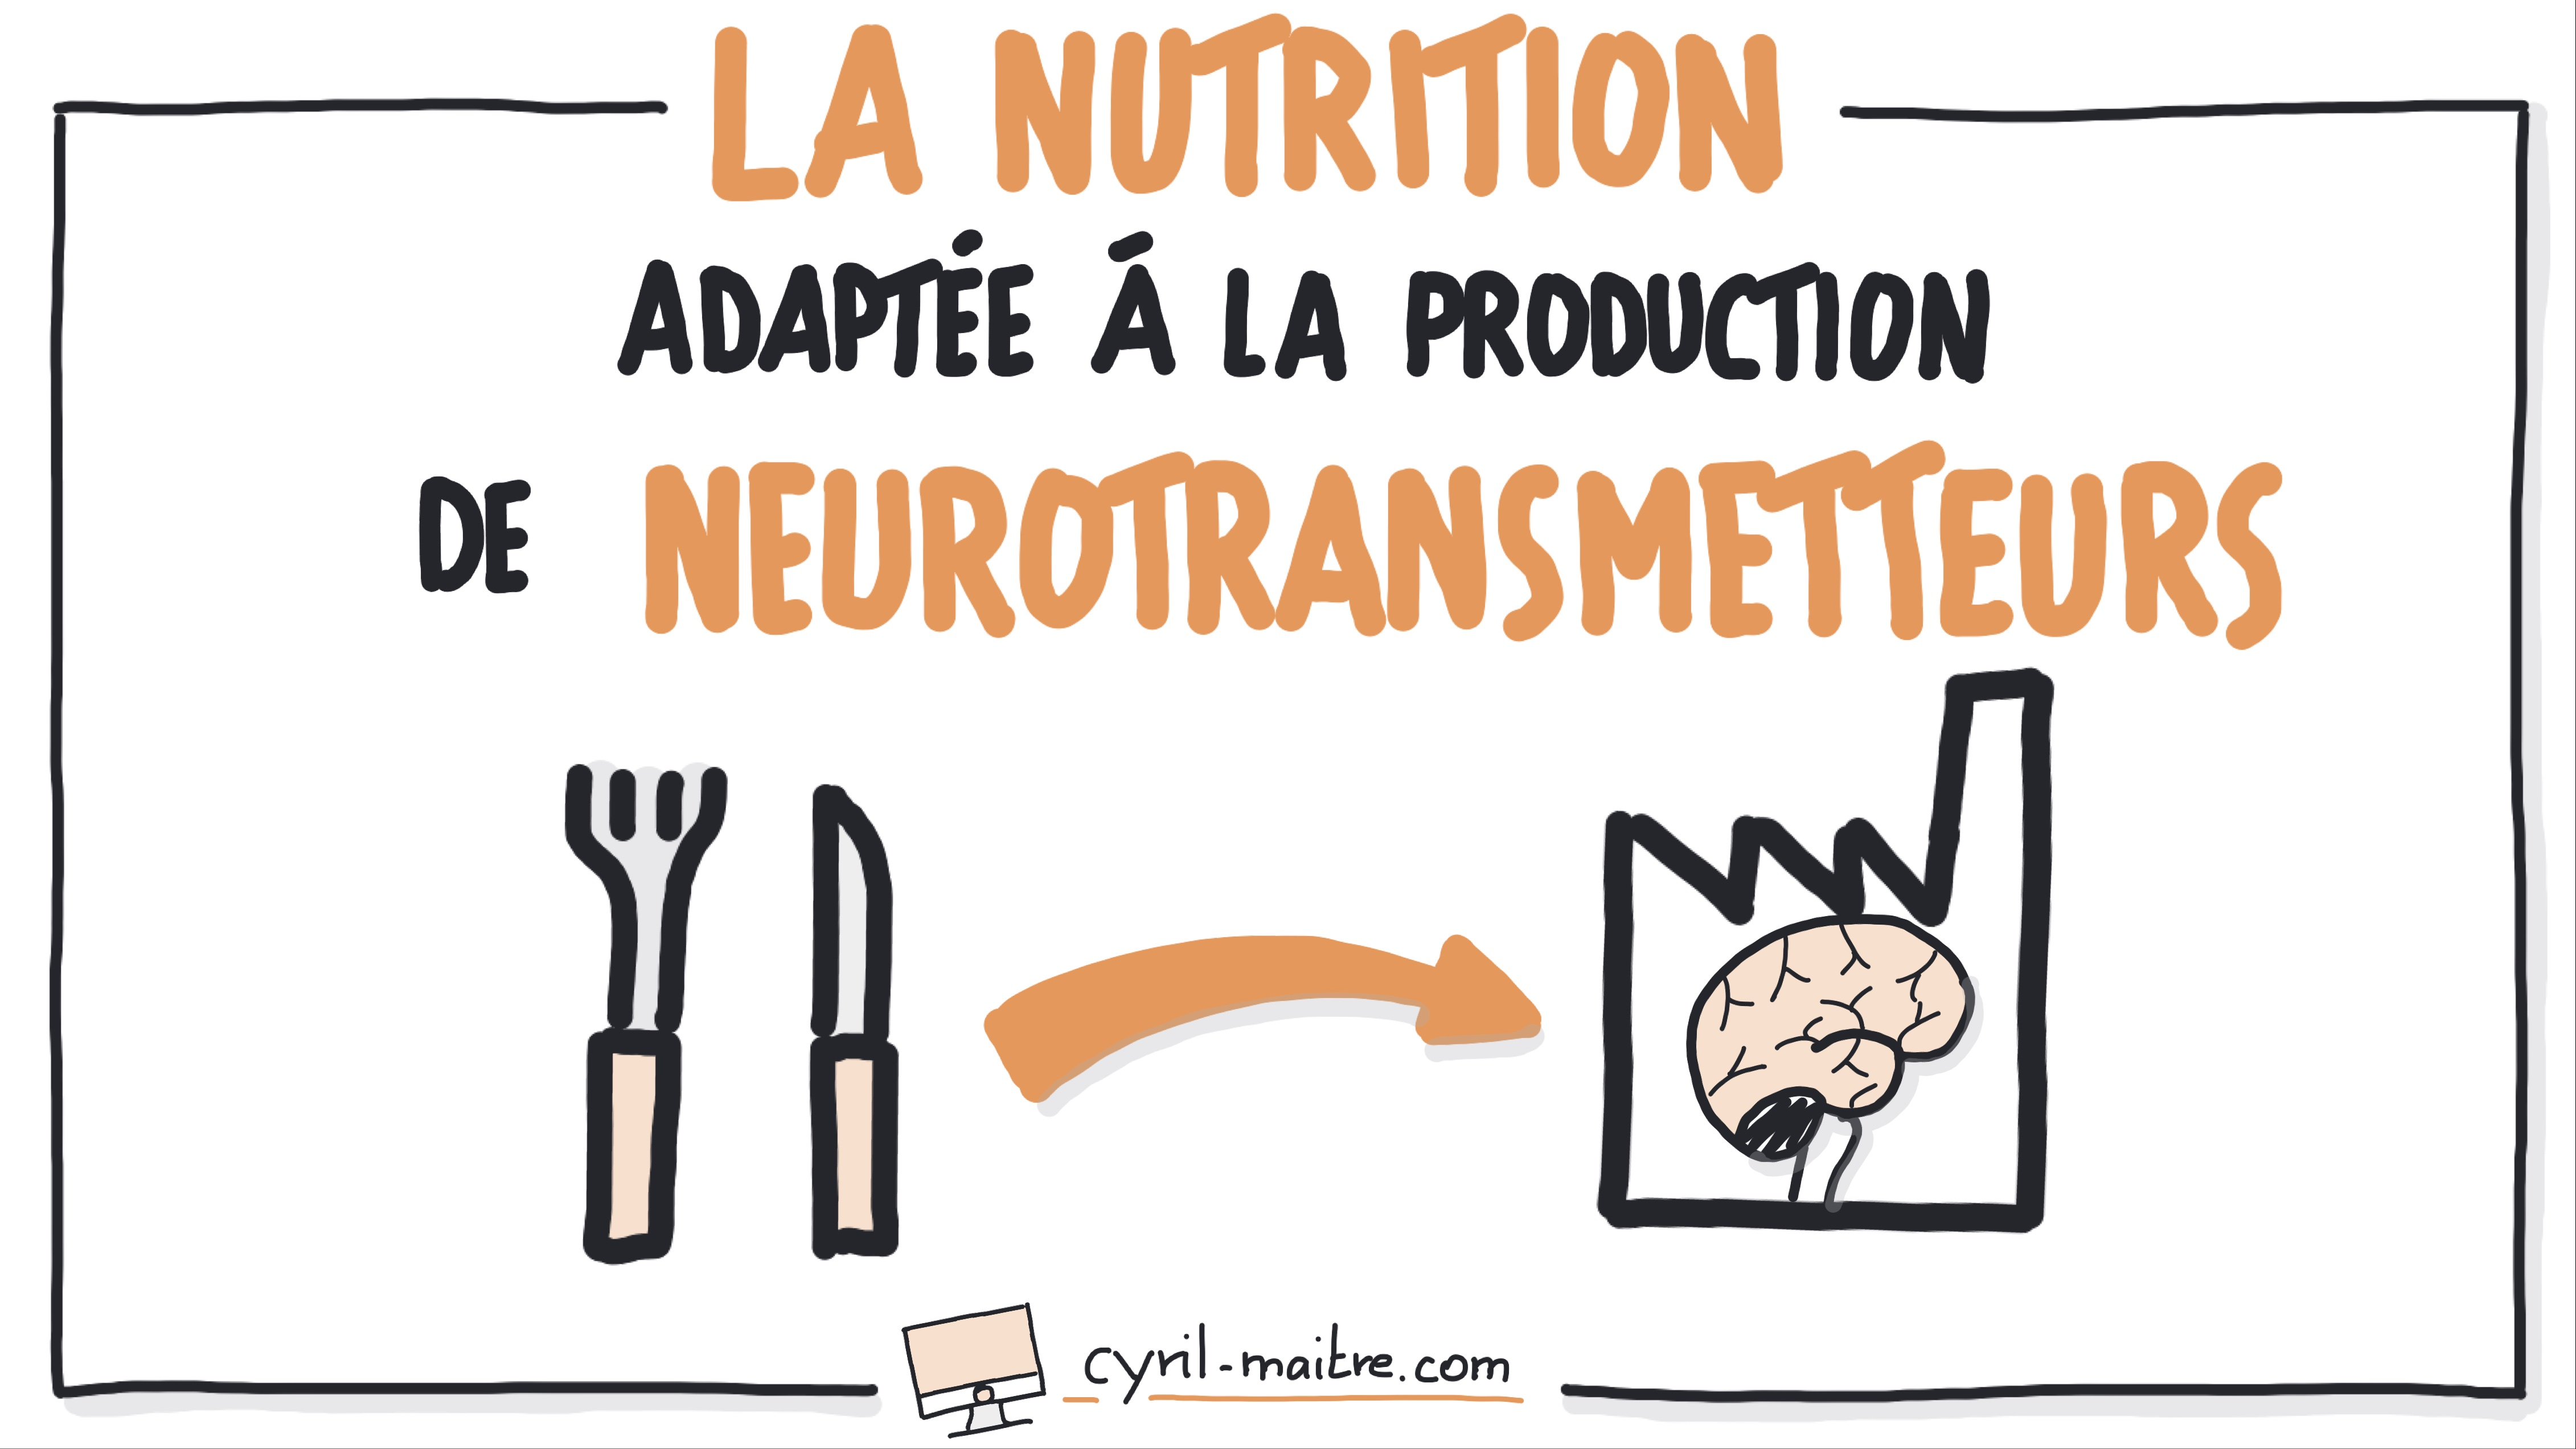 La nutrition et neurotransmetteurs